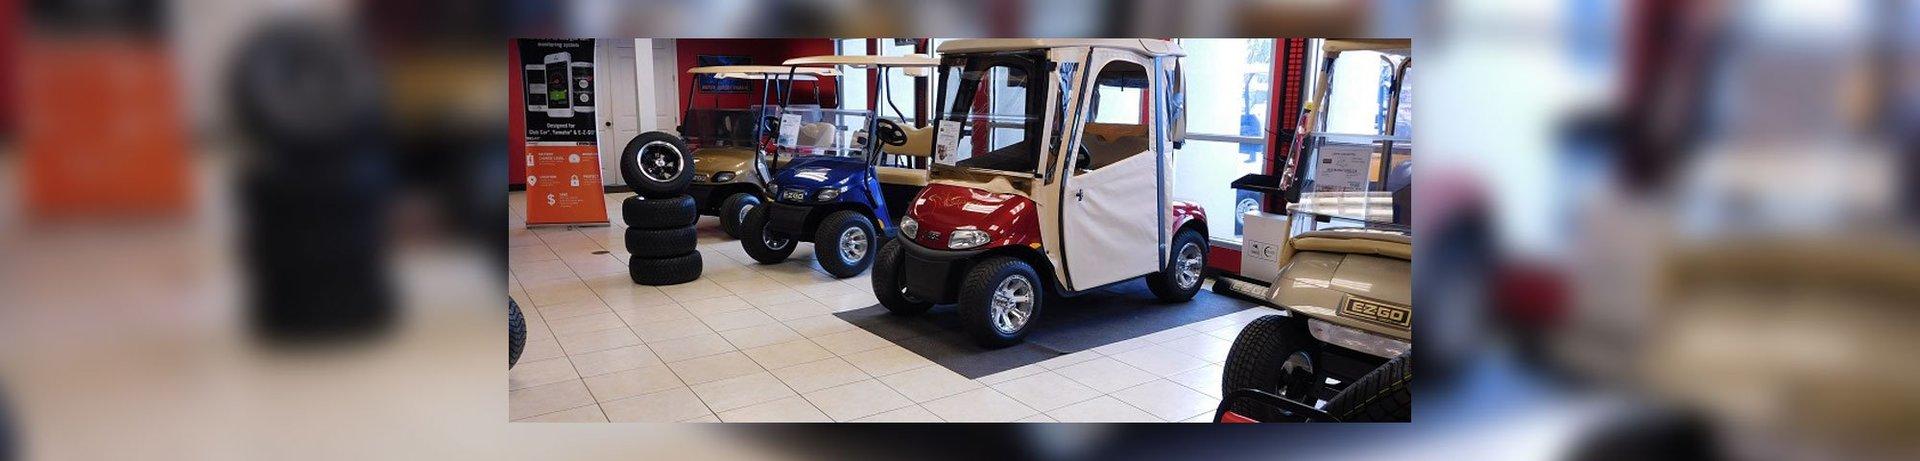 Carts Unlimited | New and Used Golf Carts | Zephyrhills, FL on golf handicap, golf hitting nets, golf card, golf words, golf machine, golf games, golf trolley, golf accessories, golf cartoons, golf tools, golf buggy, golf girls, golf players,